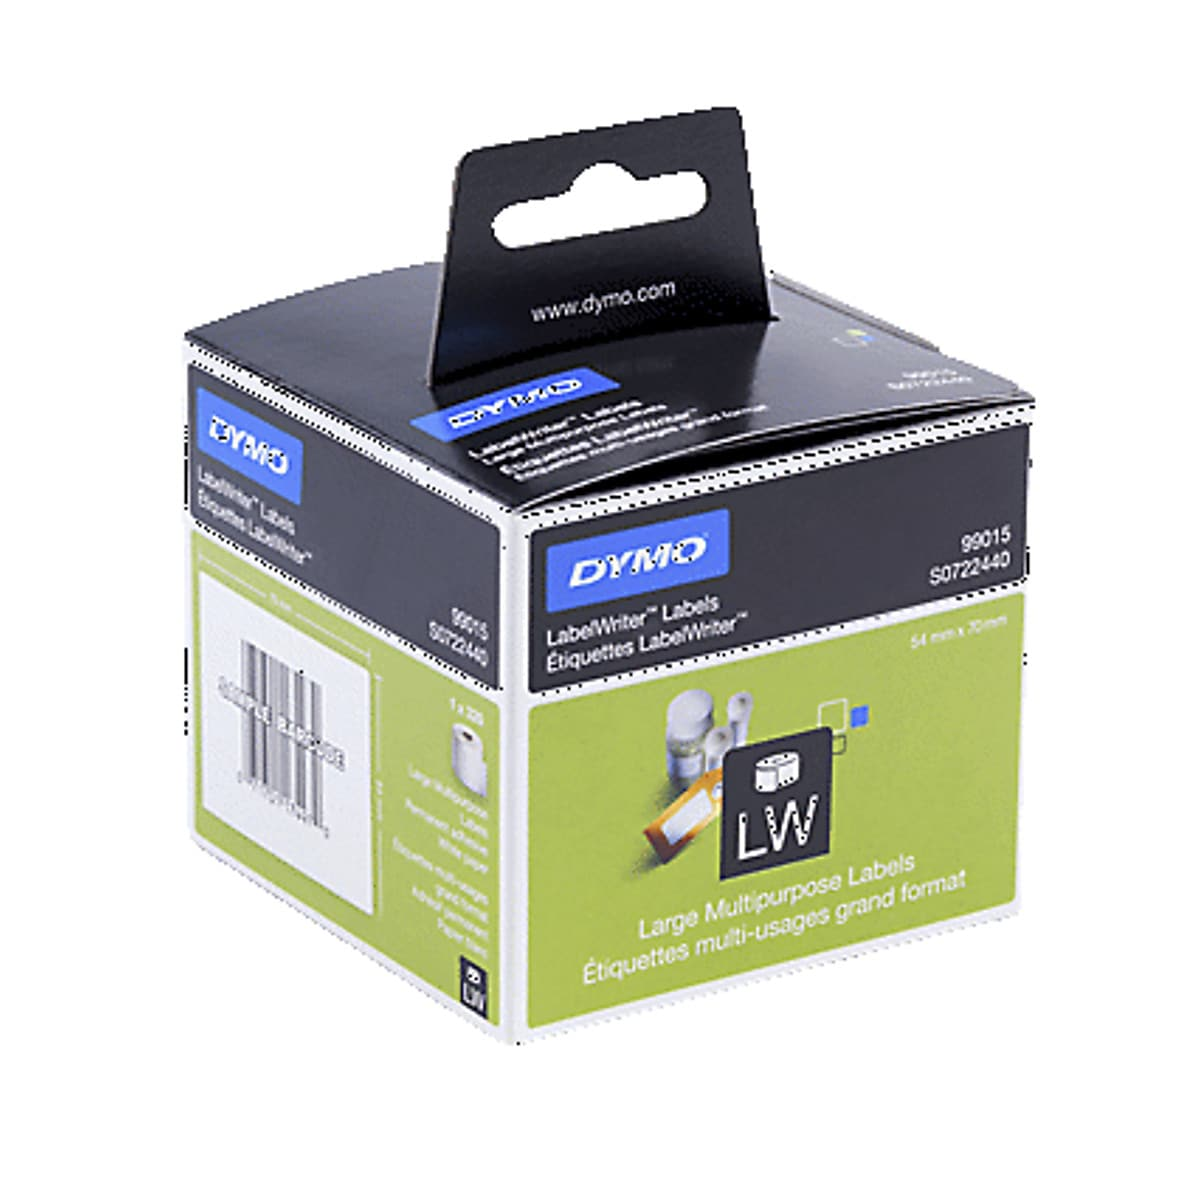 Adressetiketter Dymo LabelWriter Diskette S0722440